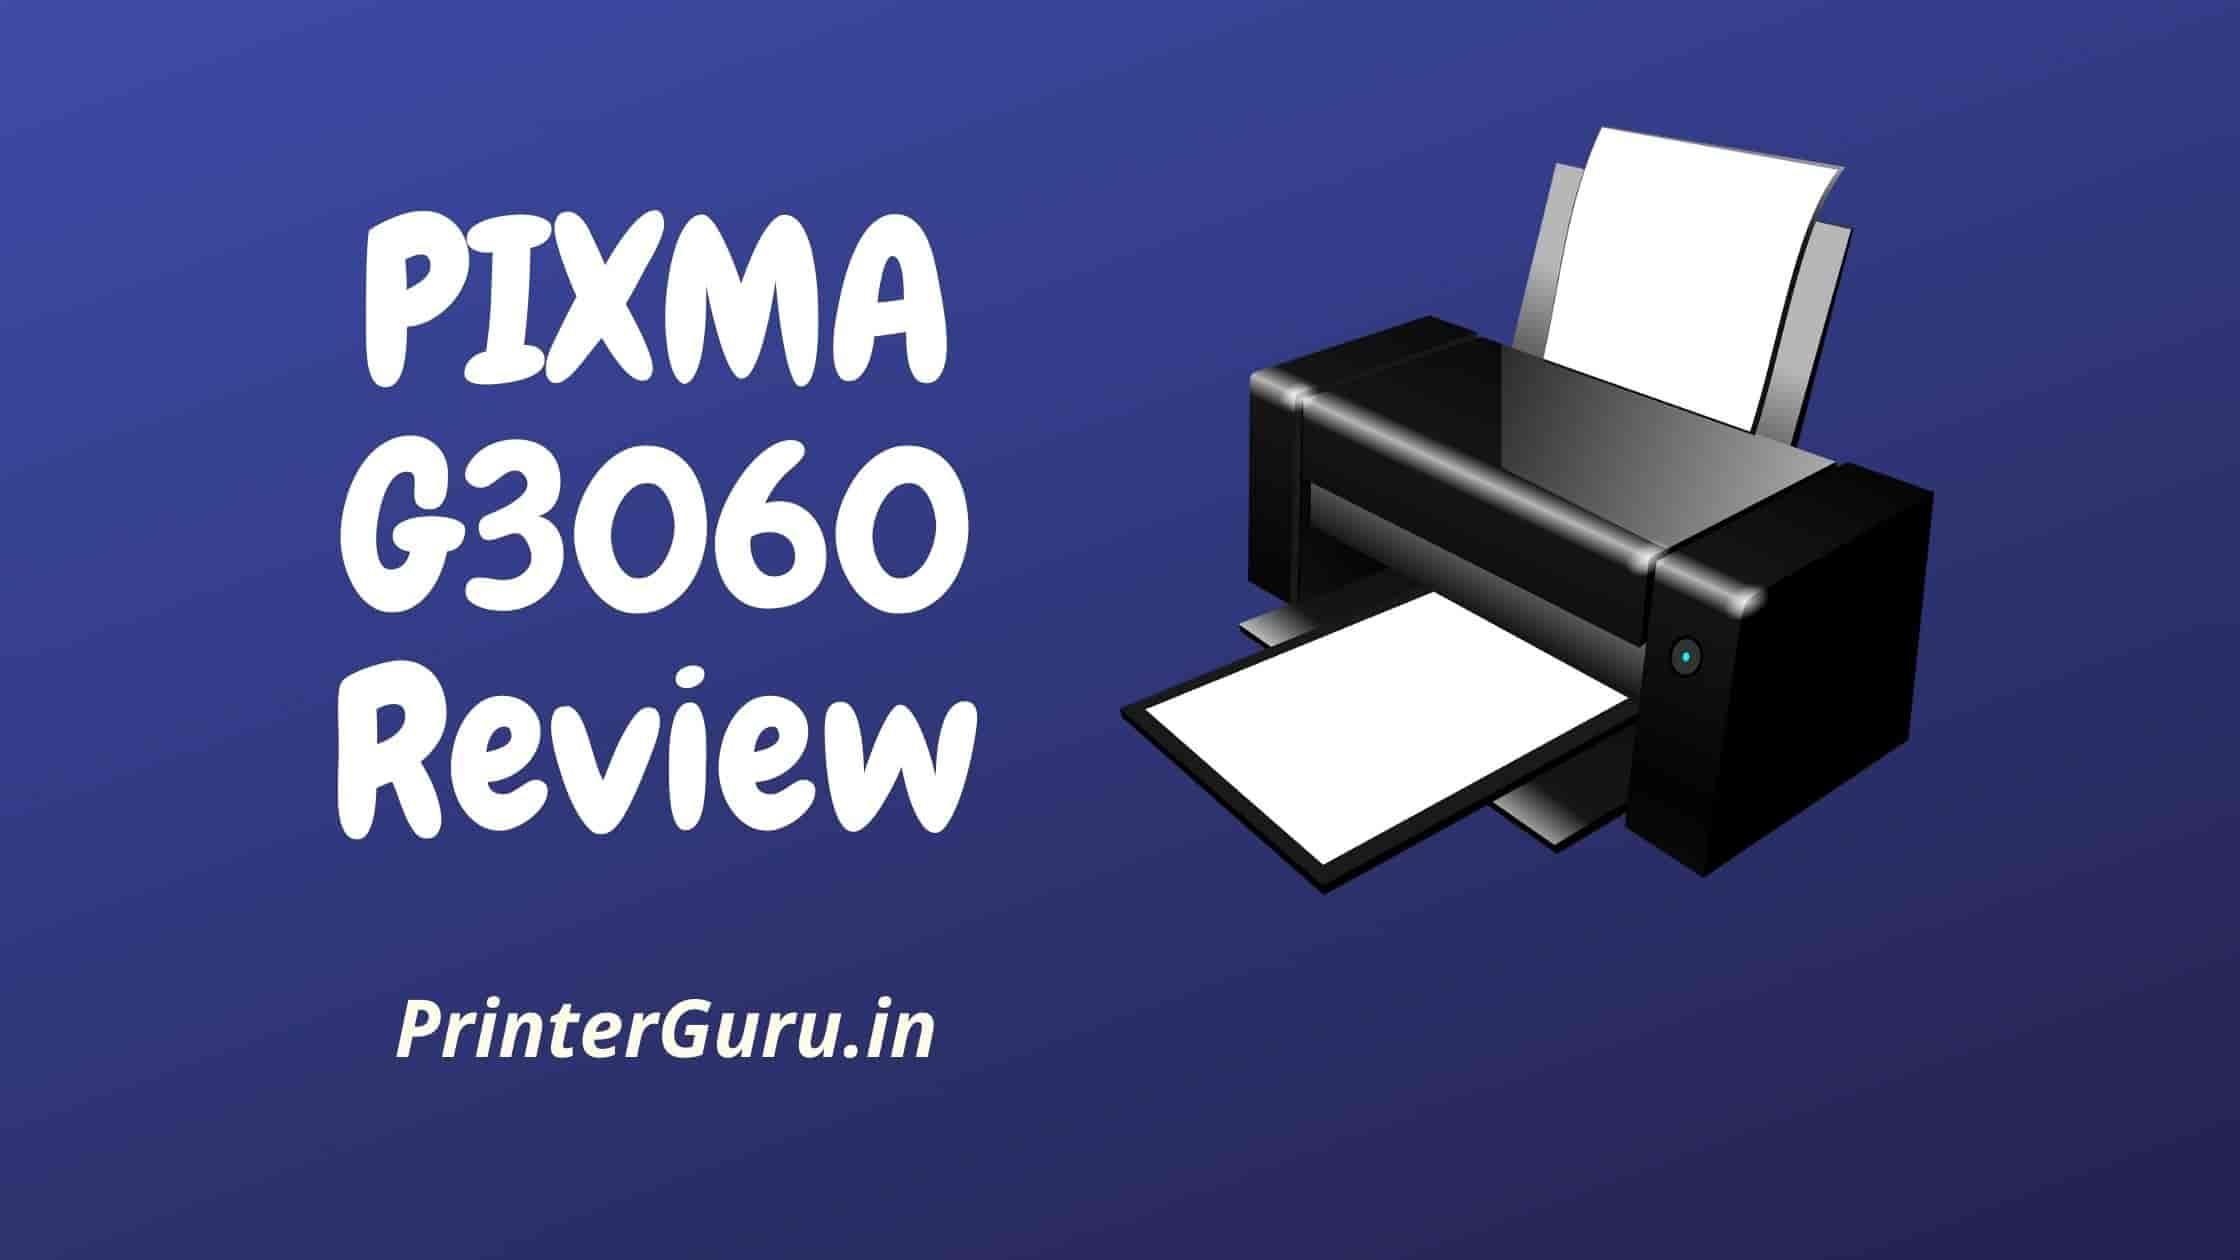 Canon Pixma G3060 Review